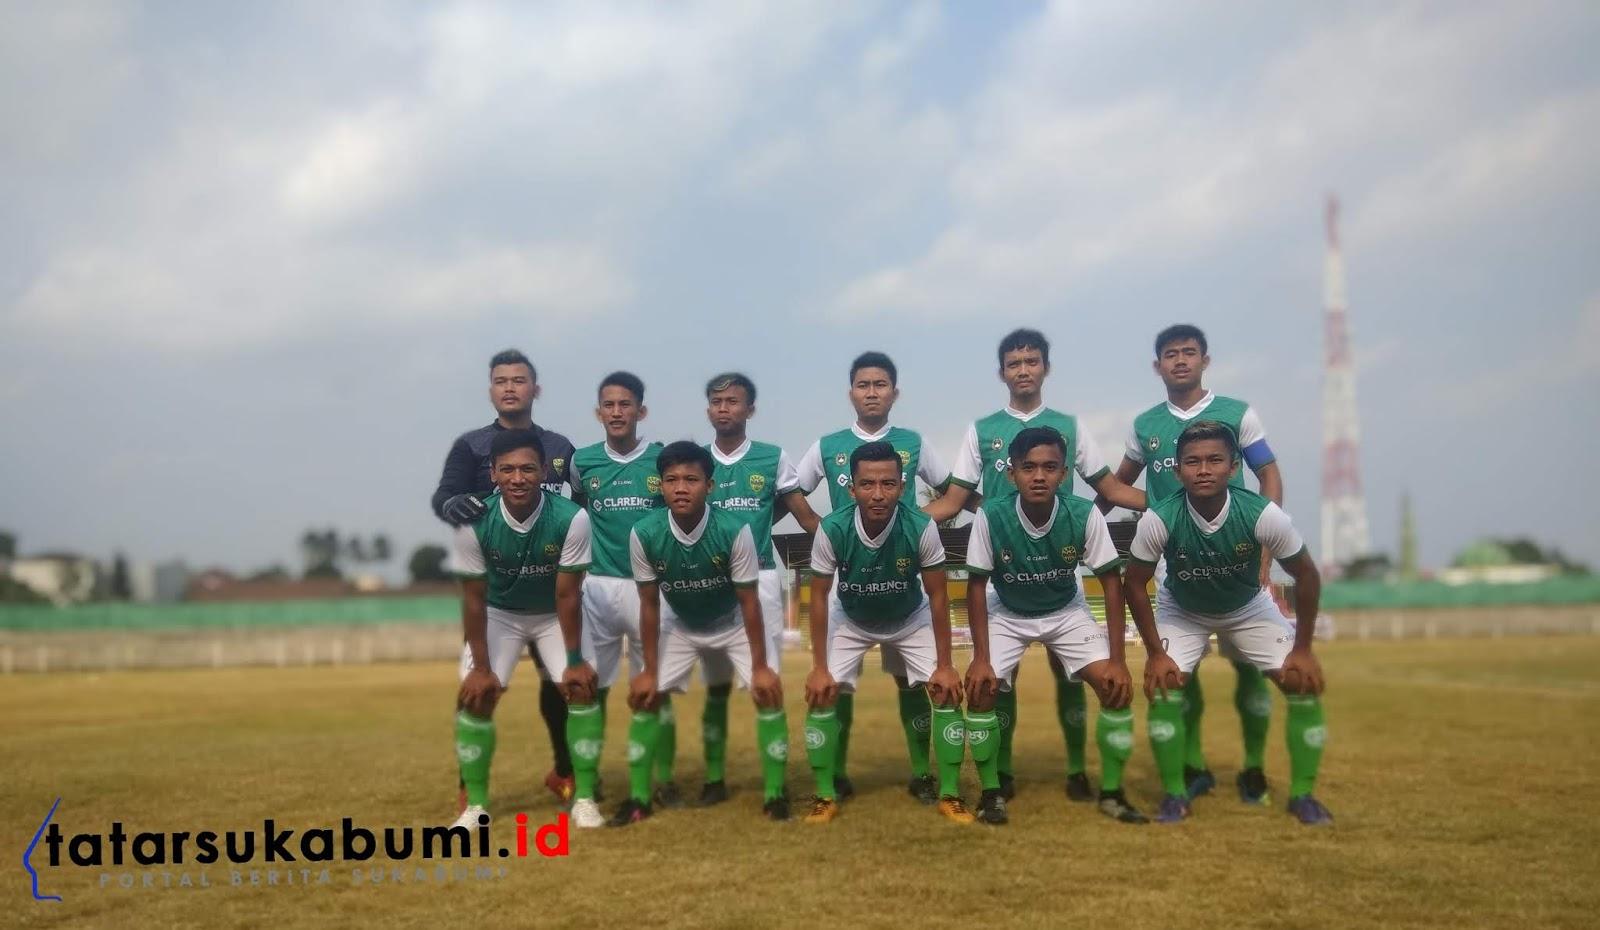 Bintang Timur FC Sukabumi Ditahan Imbang Depok United Liga 3 Jabar